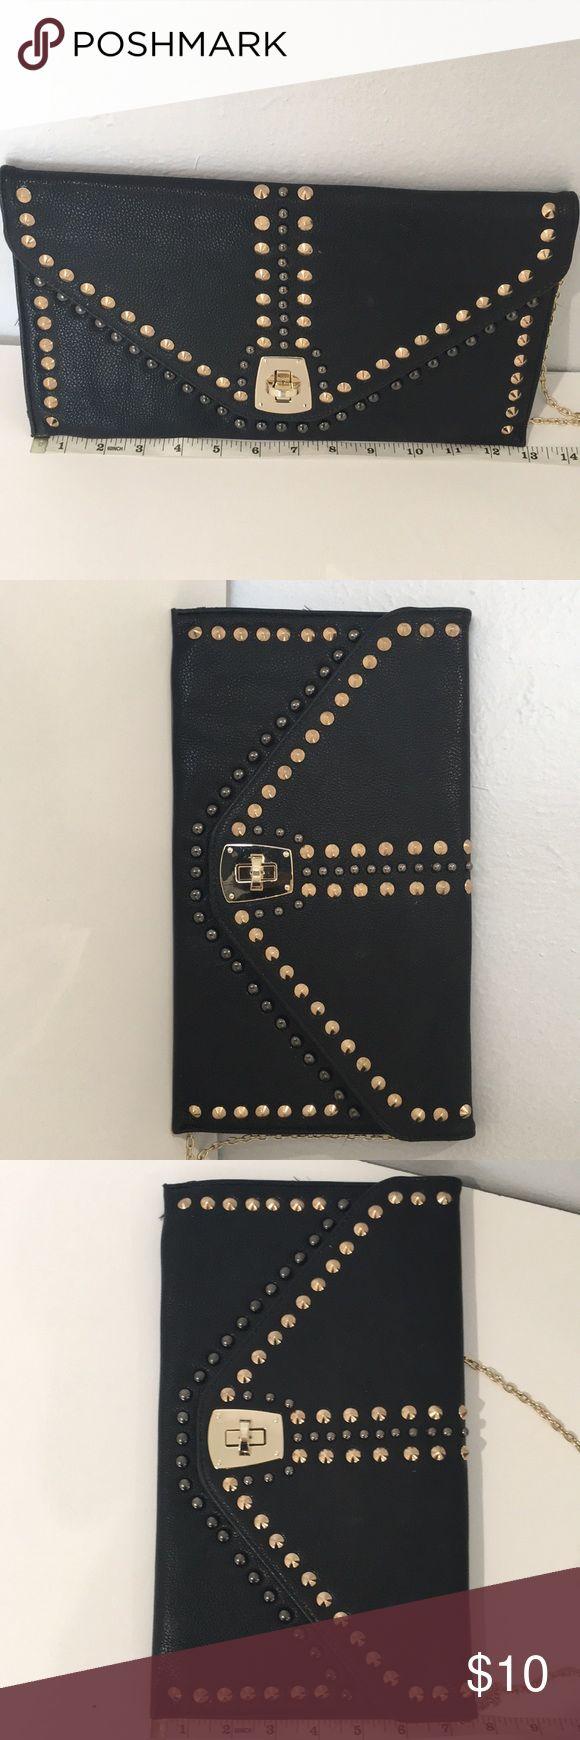 Clutch/crossbody bag Brand new clutch/crossbody bag with gold studs MMS Design Studio Bags Clutches & Wristlets